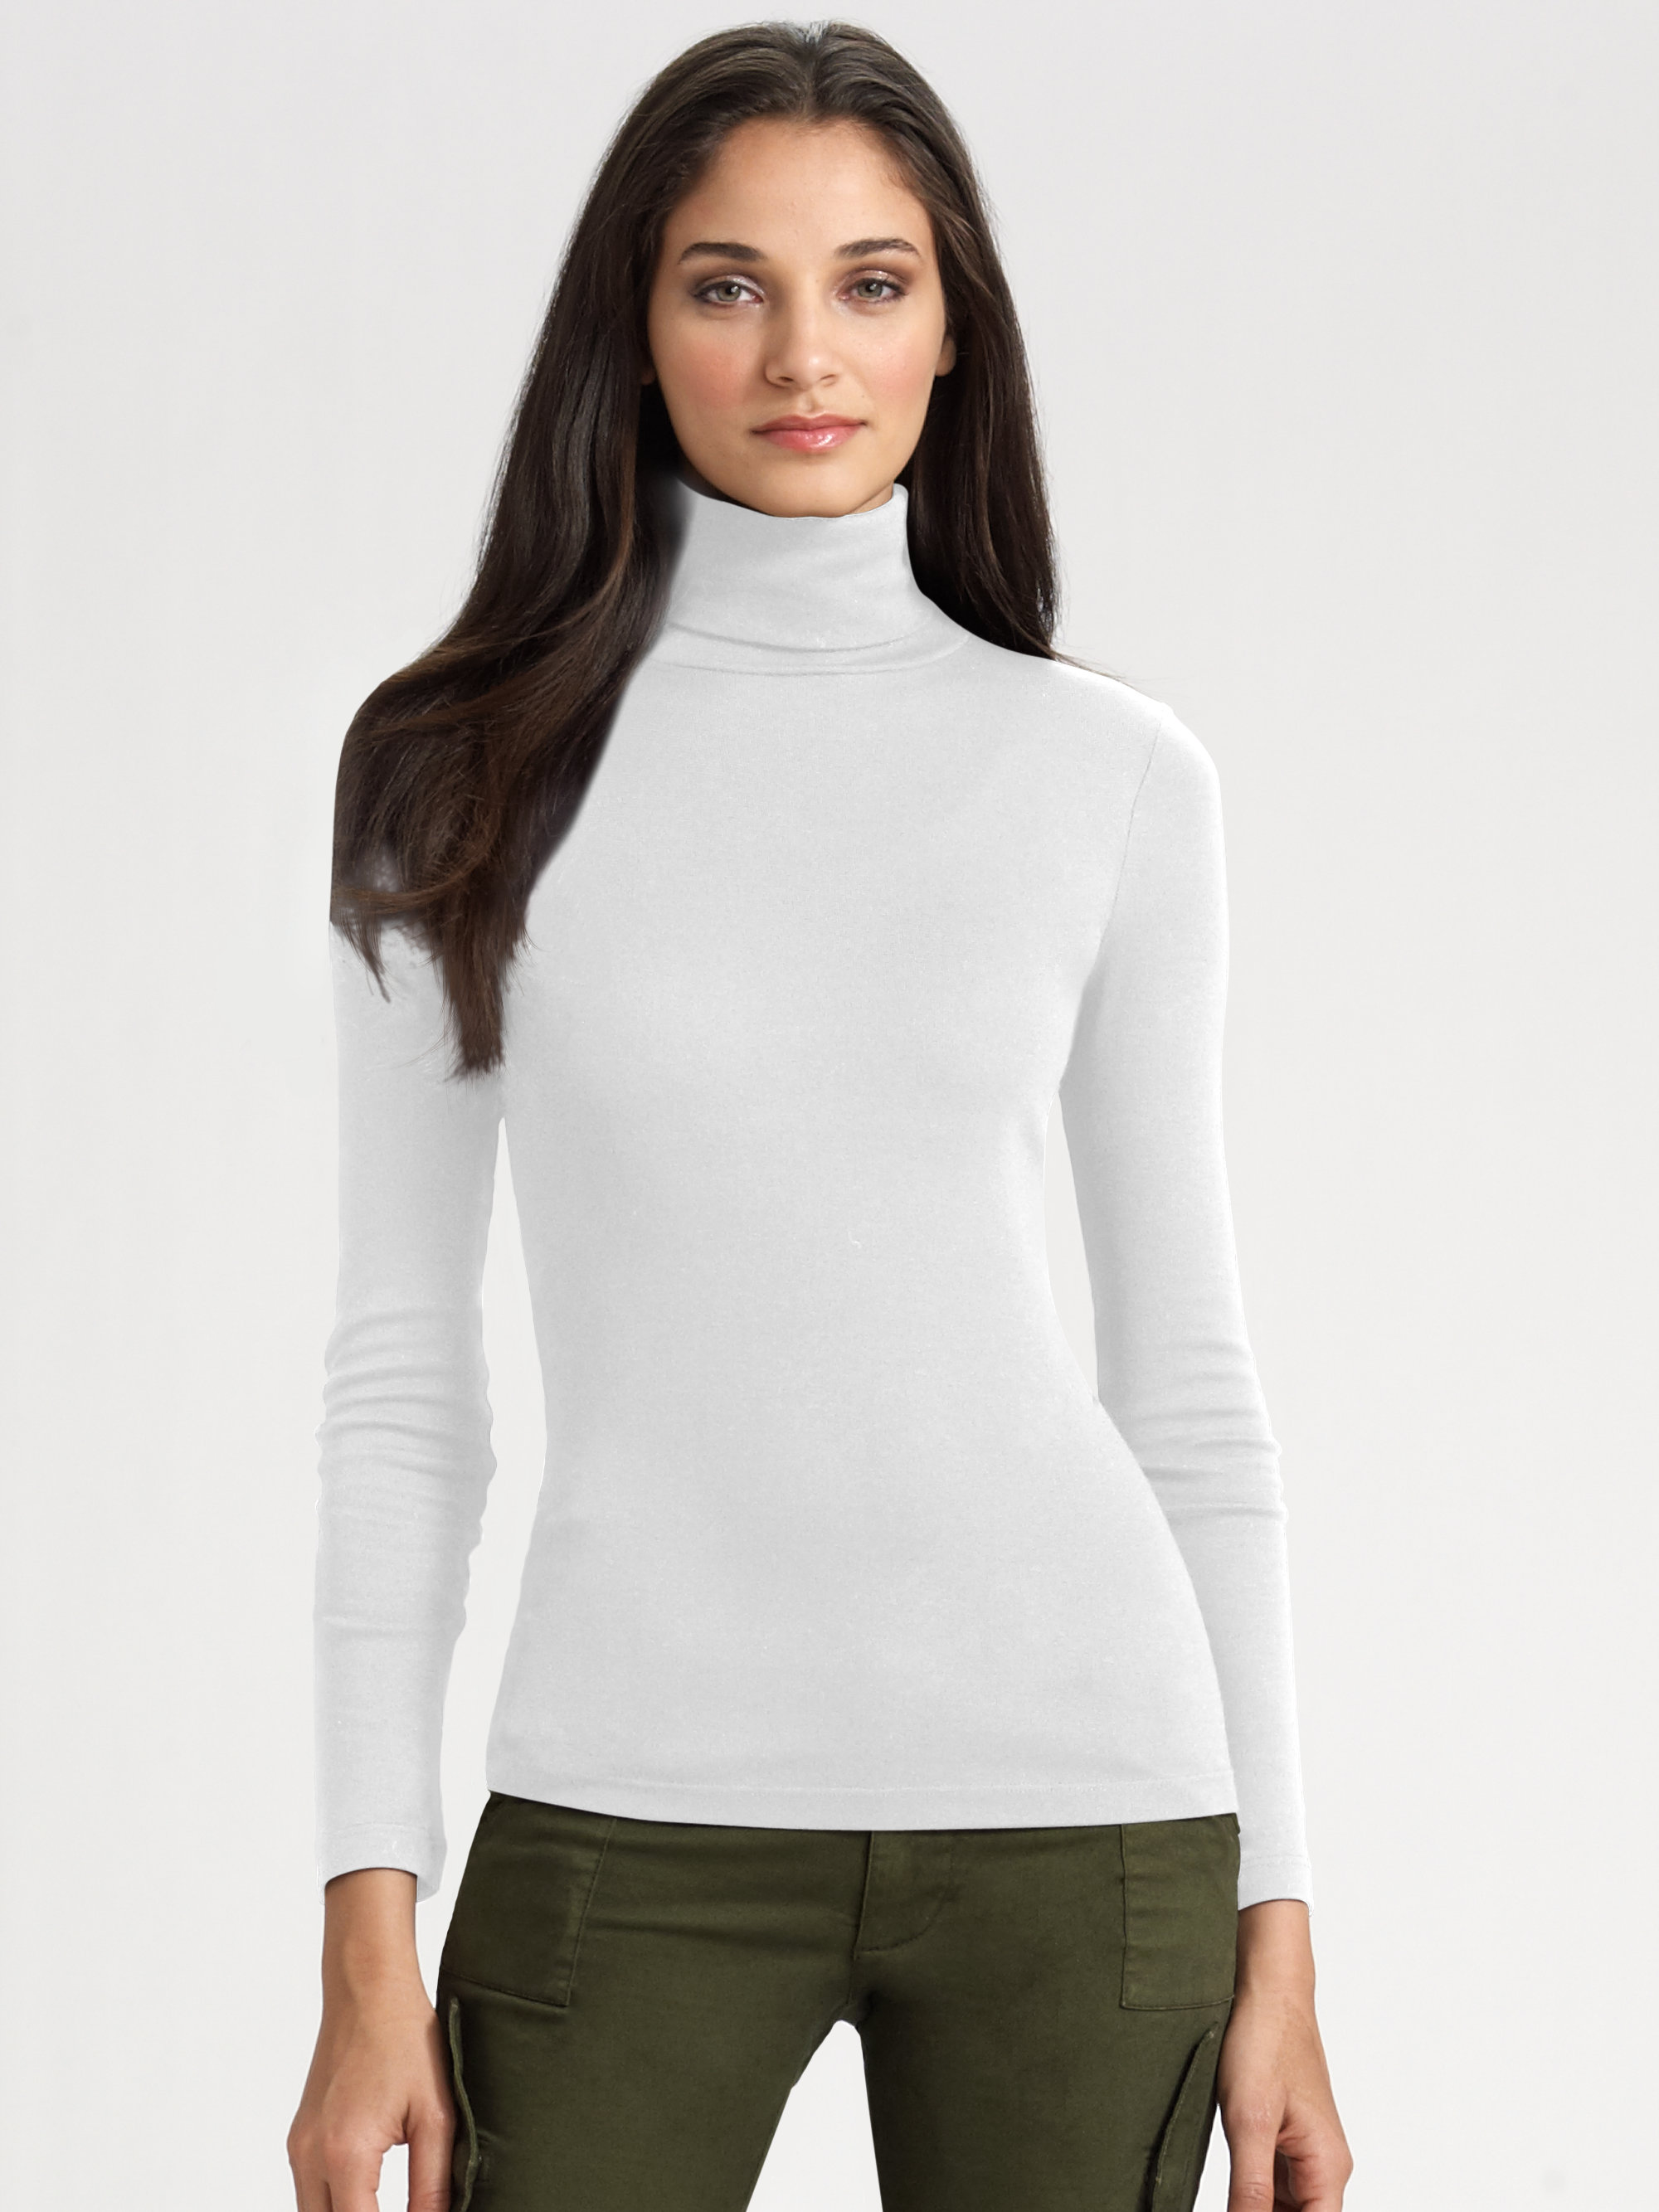 Fashion Turtleneck Dress